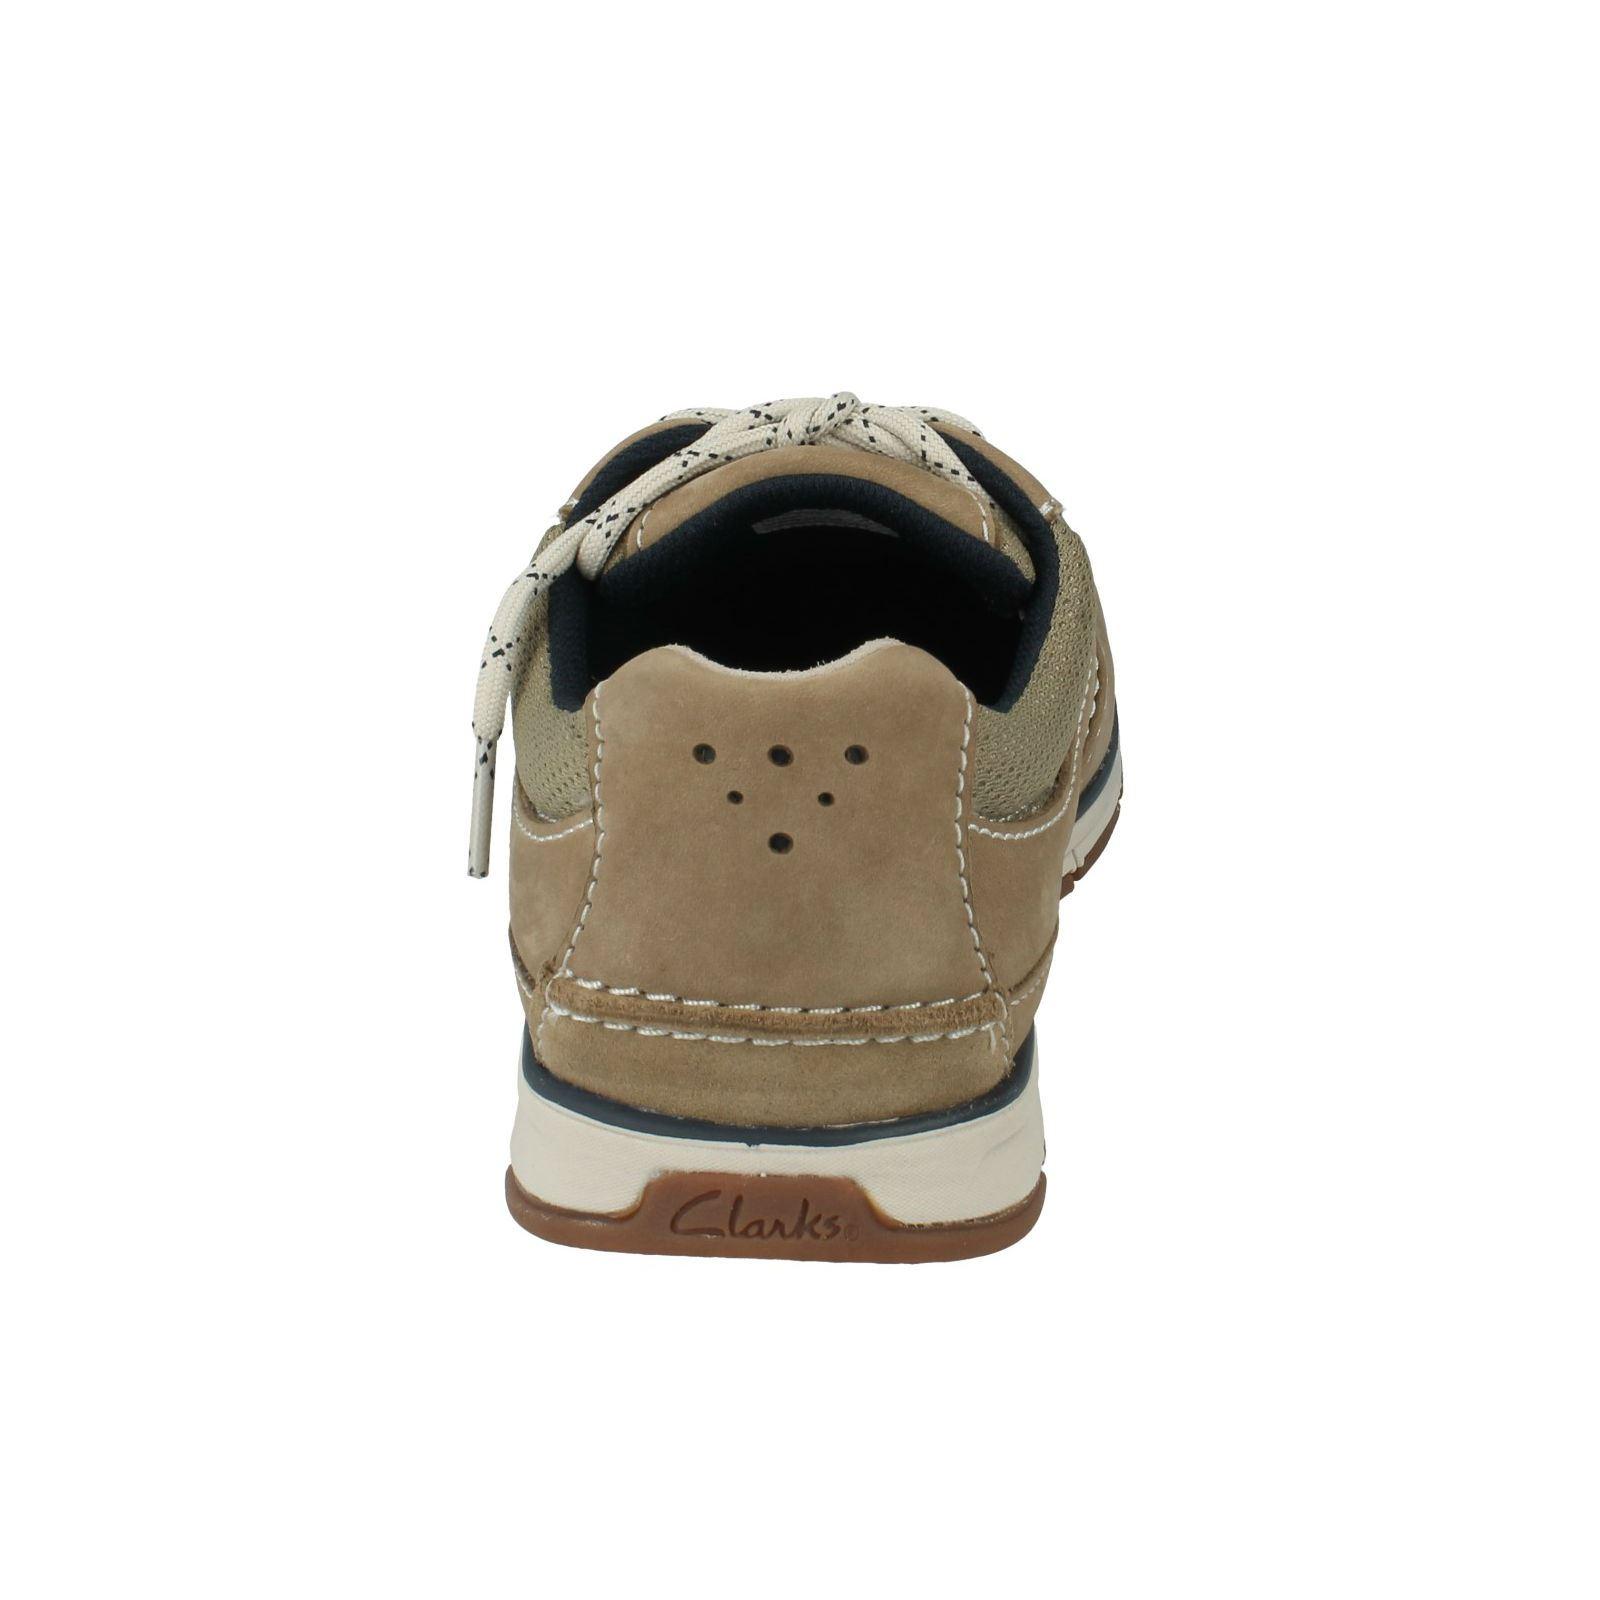 Homme clarks clarks clarks chaussures de loisirs étiquette-beachmont edge   Apparence Attrayante  b1eb92